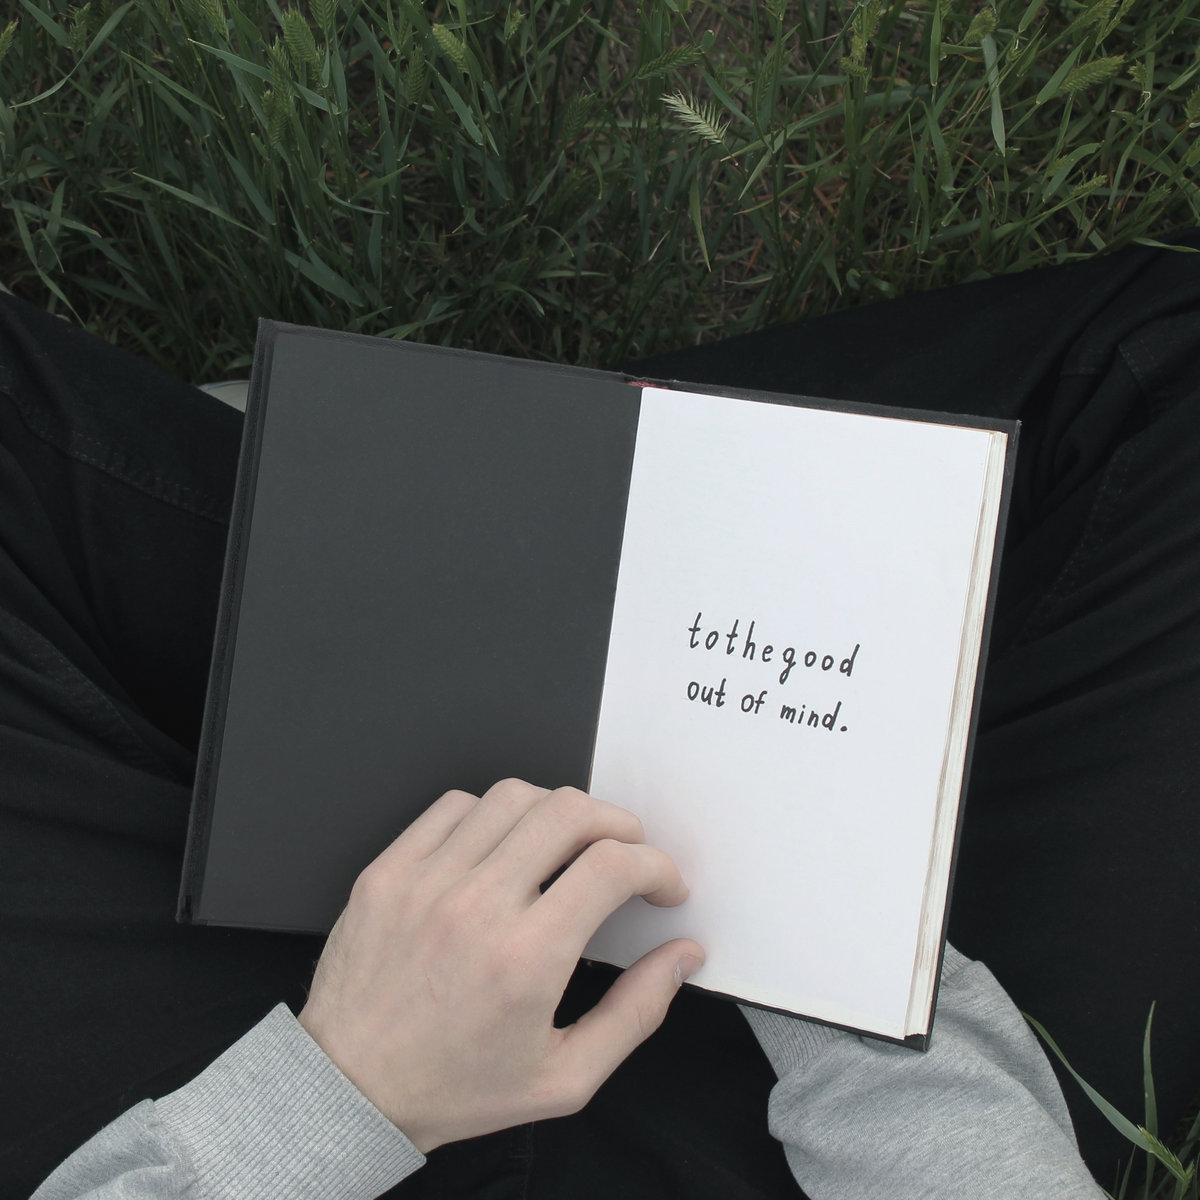 tothegood - in silence (feat  LIL LOTUS & fats'e) | tothegood